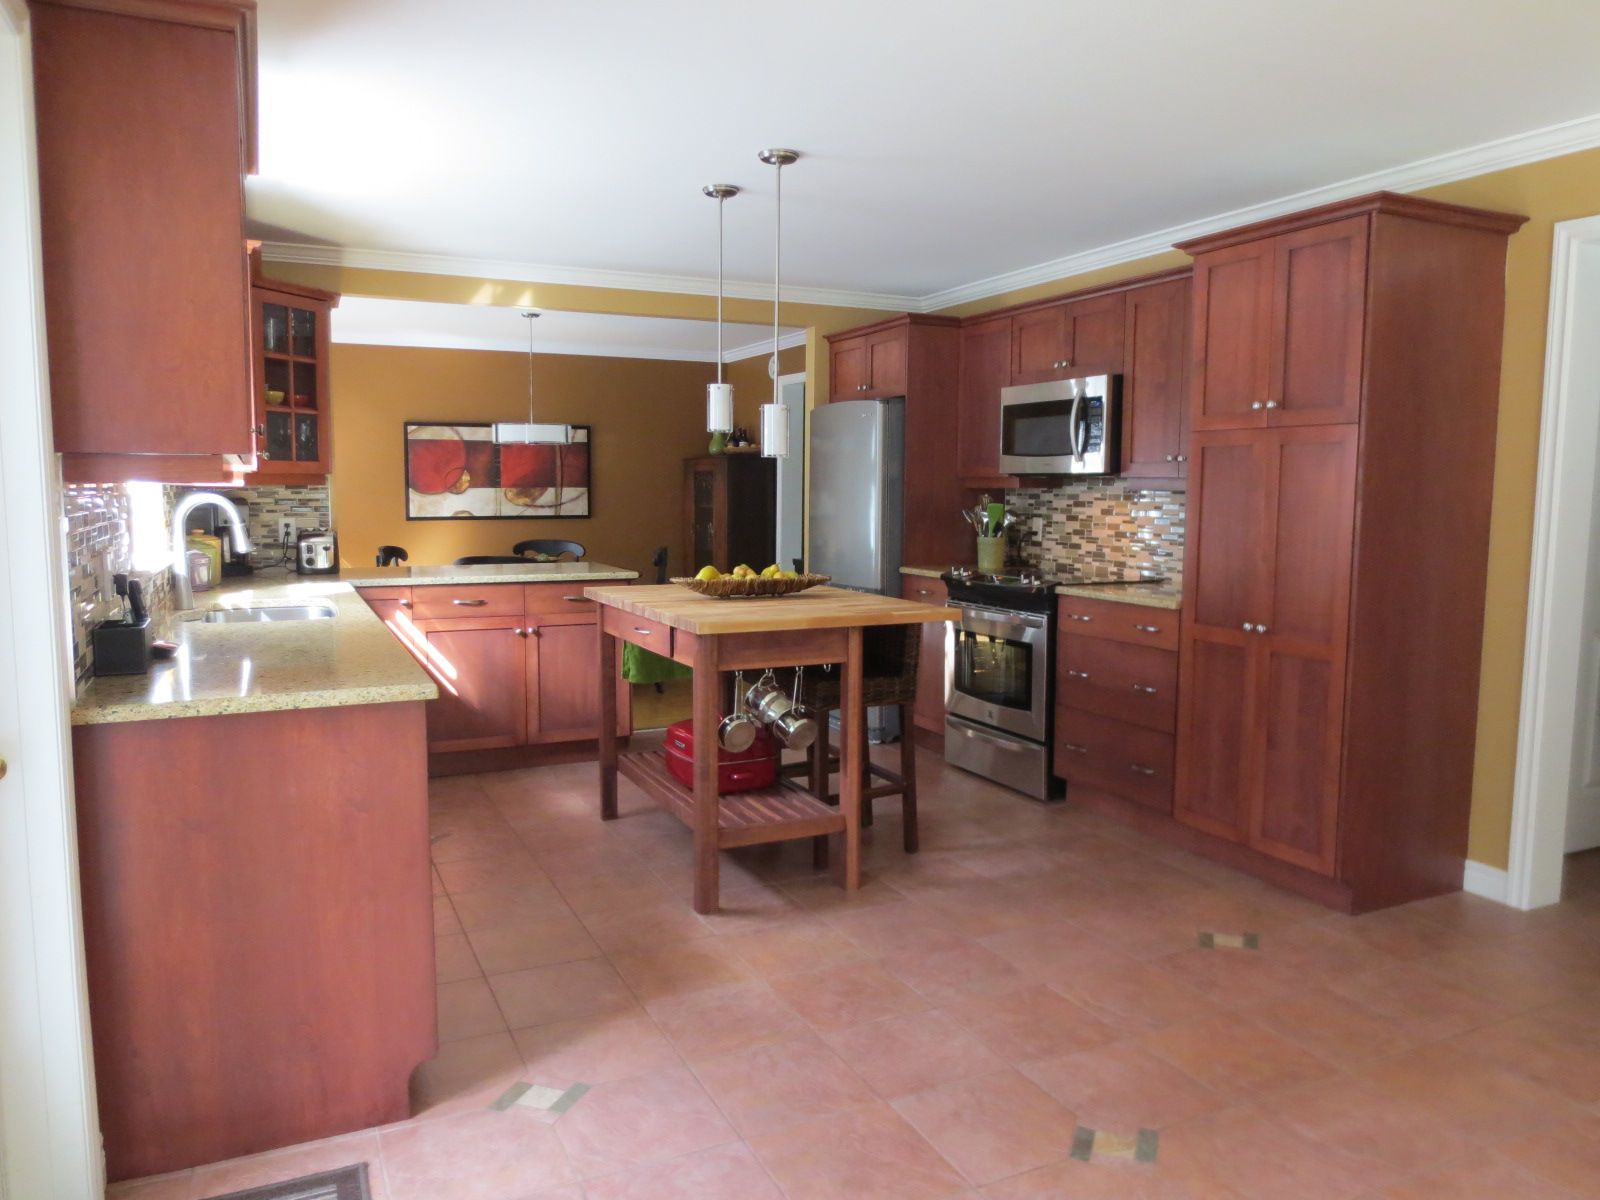 Kitchen Cabinets St Catharines Kitchen Cabinet Door Refinishing Halifax Nova Scotia 902 448 2108